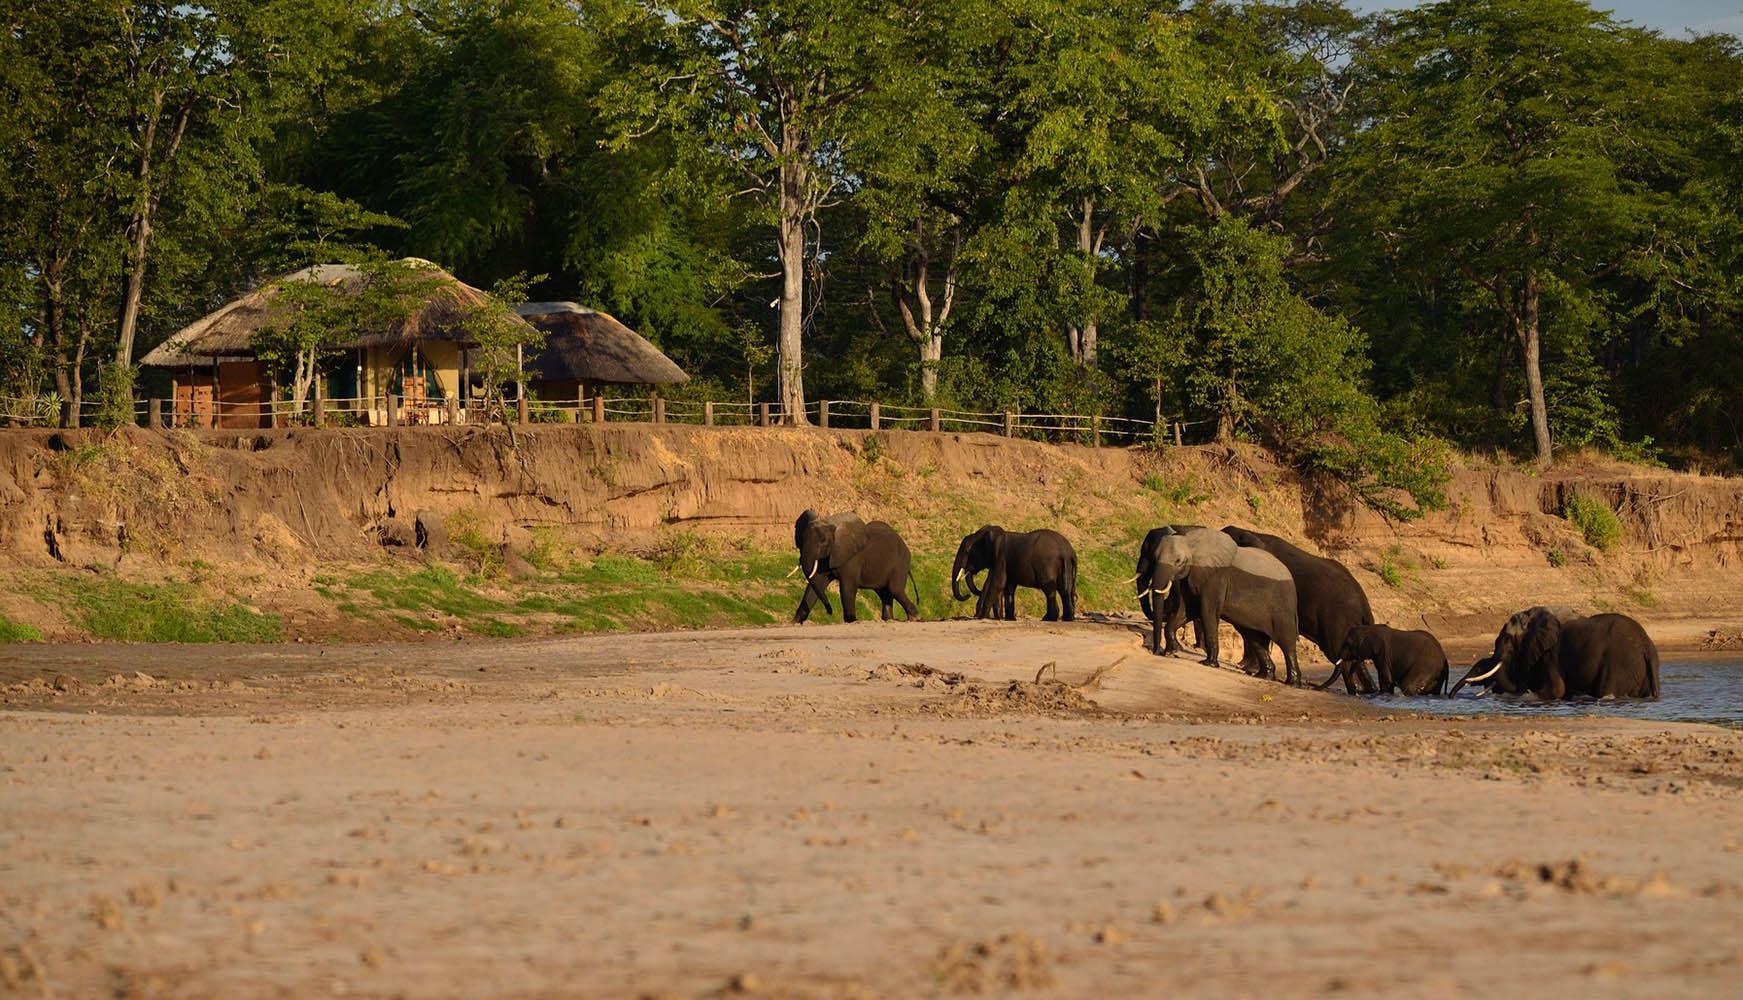 wet-wild-south-luangwa-lake-malawi-11-nights-bush-beach-safaris-tours-malawian-style-specialist-tour-operator-travel-explore-malawi-wildlife-camp-south-luangwa-elephants